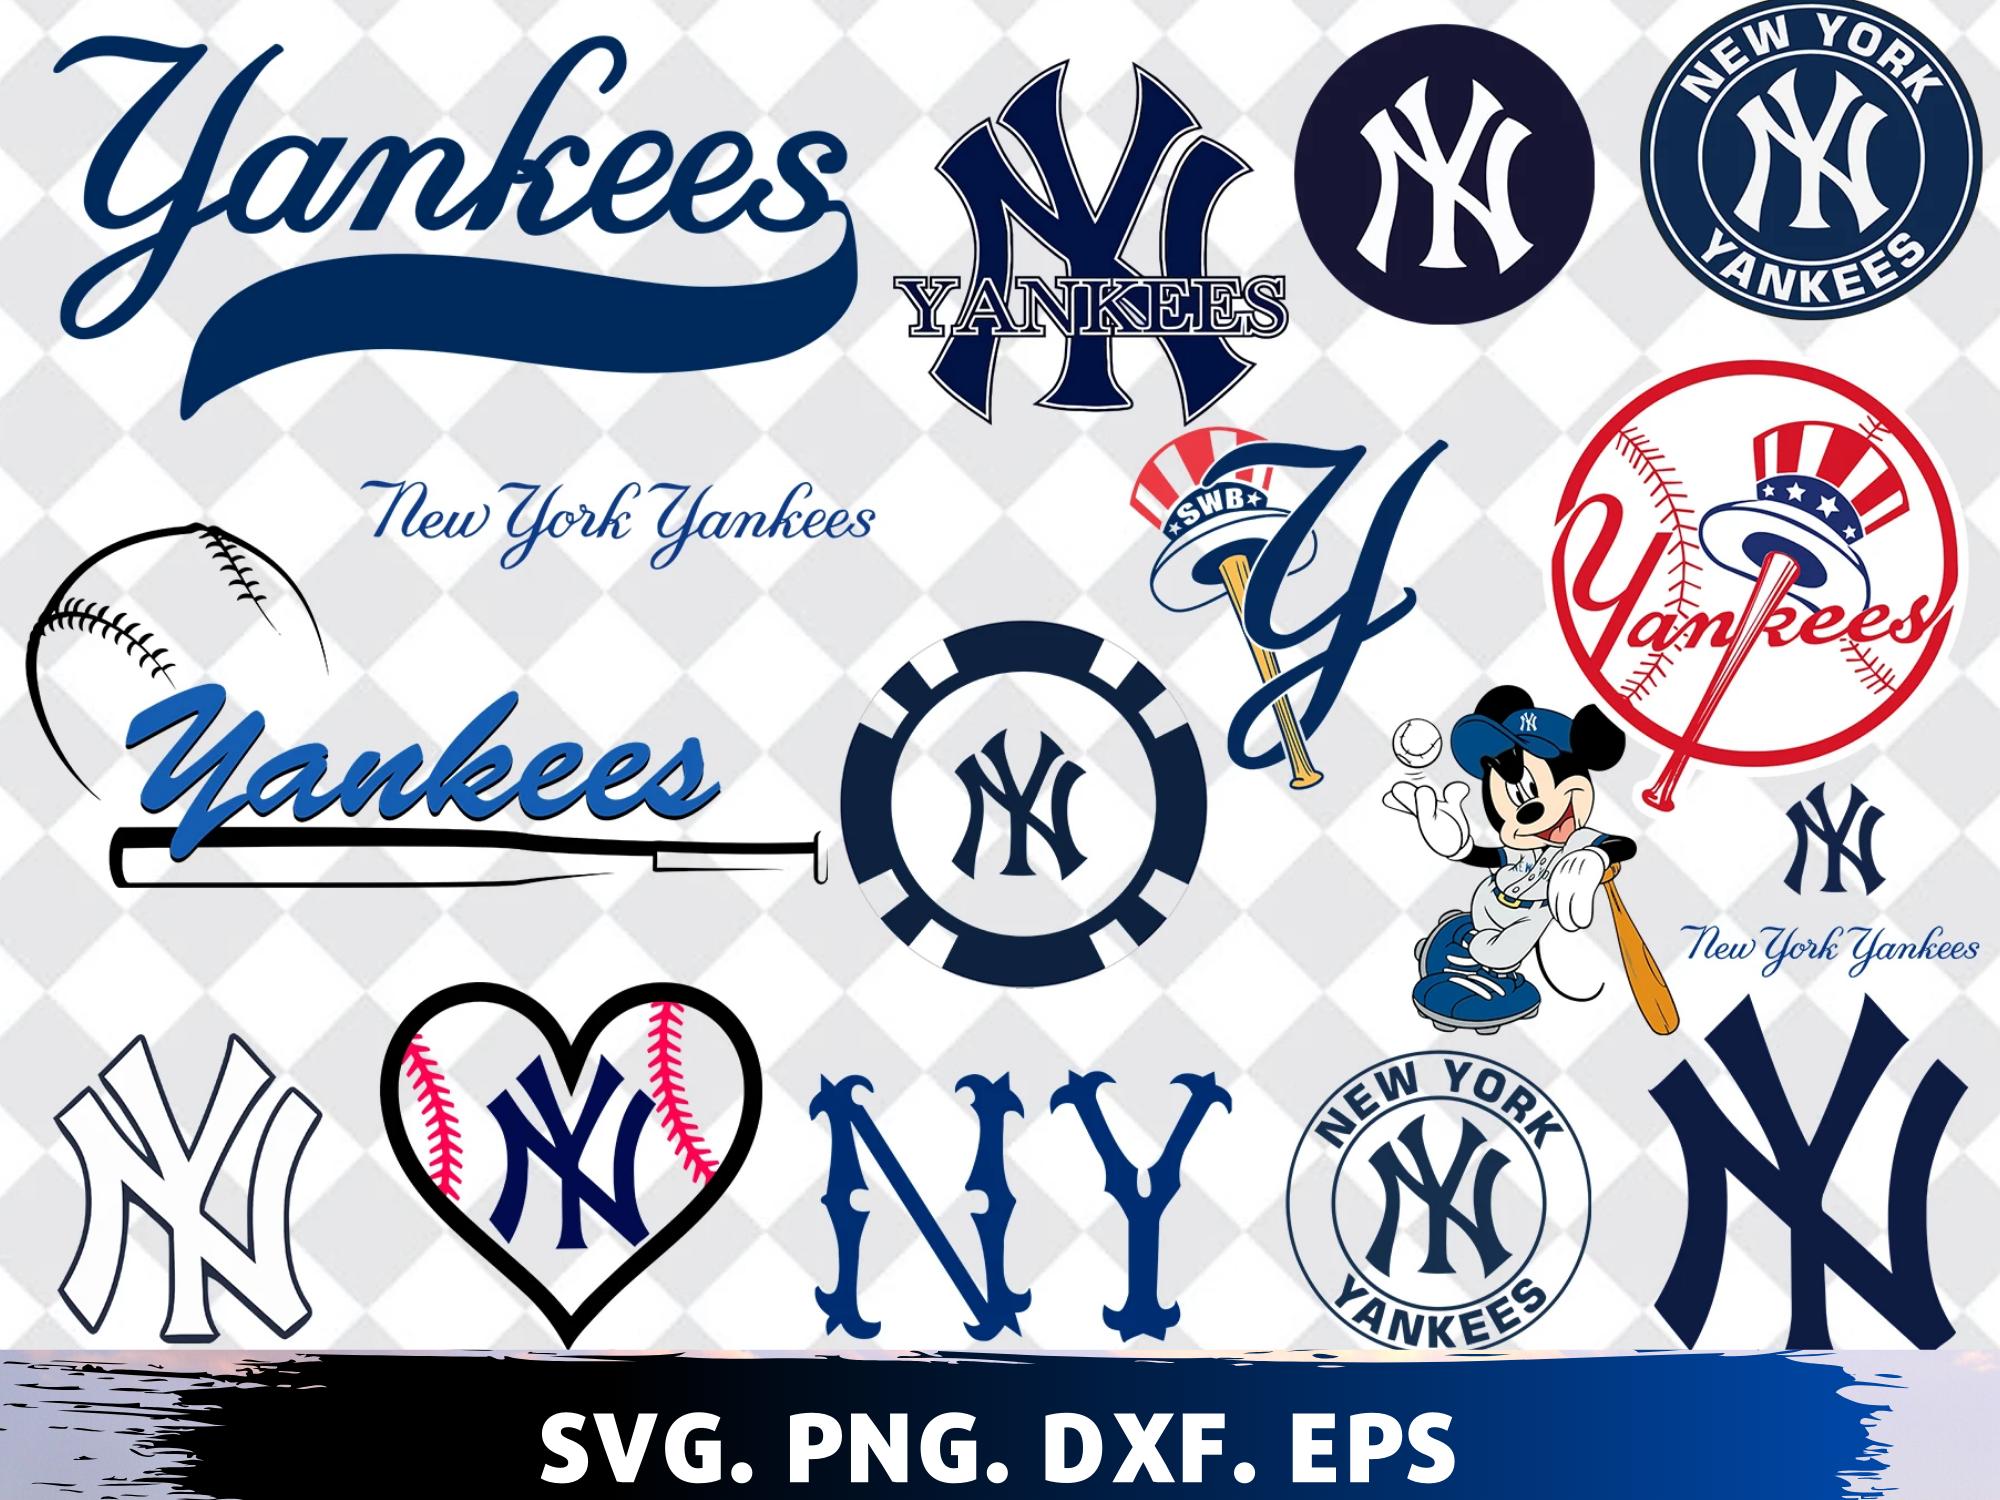 Clipartshop New York Yankees New York Yankees Svg New York Yankees Clipart New York Yankees Logo New York Yankees Cricut In 2020 New York Yankees Svg New York Yankees Logo